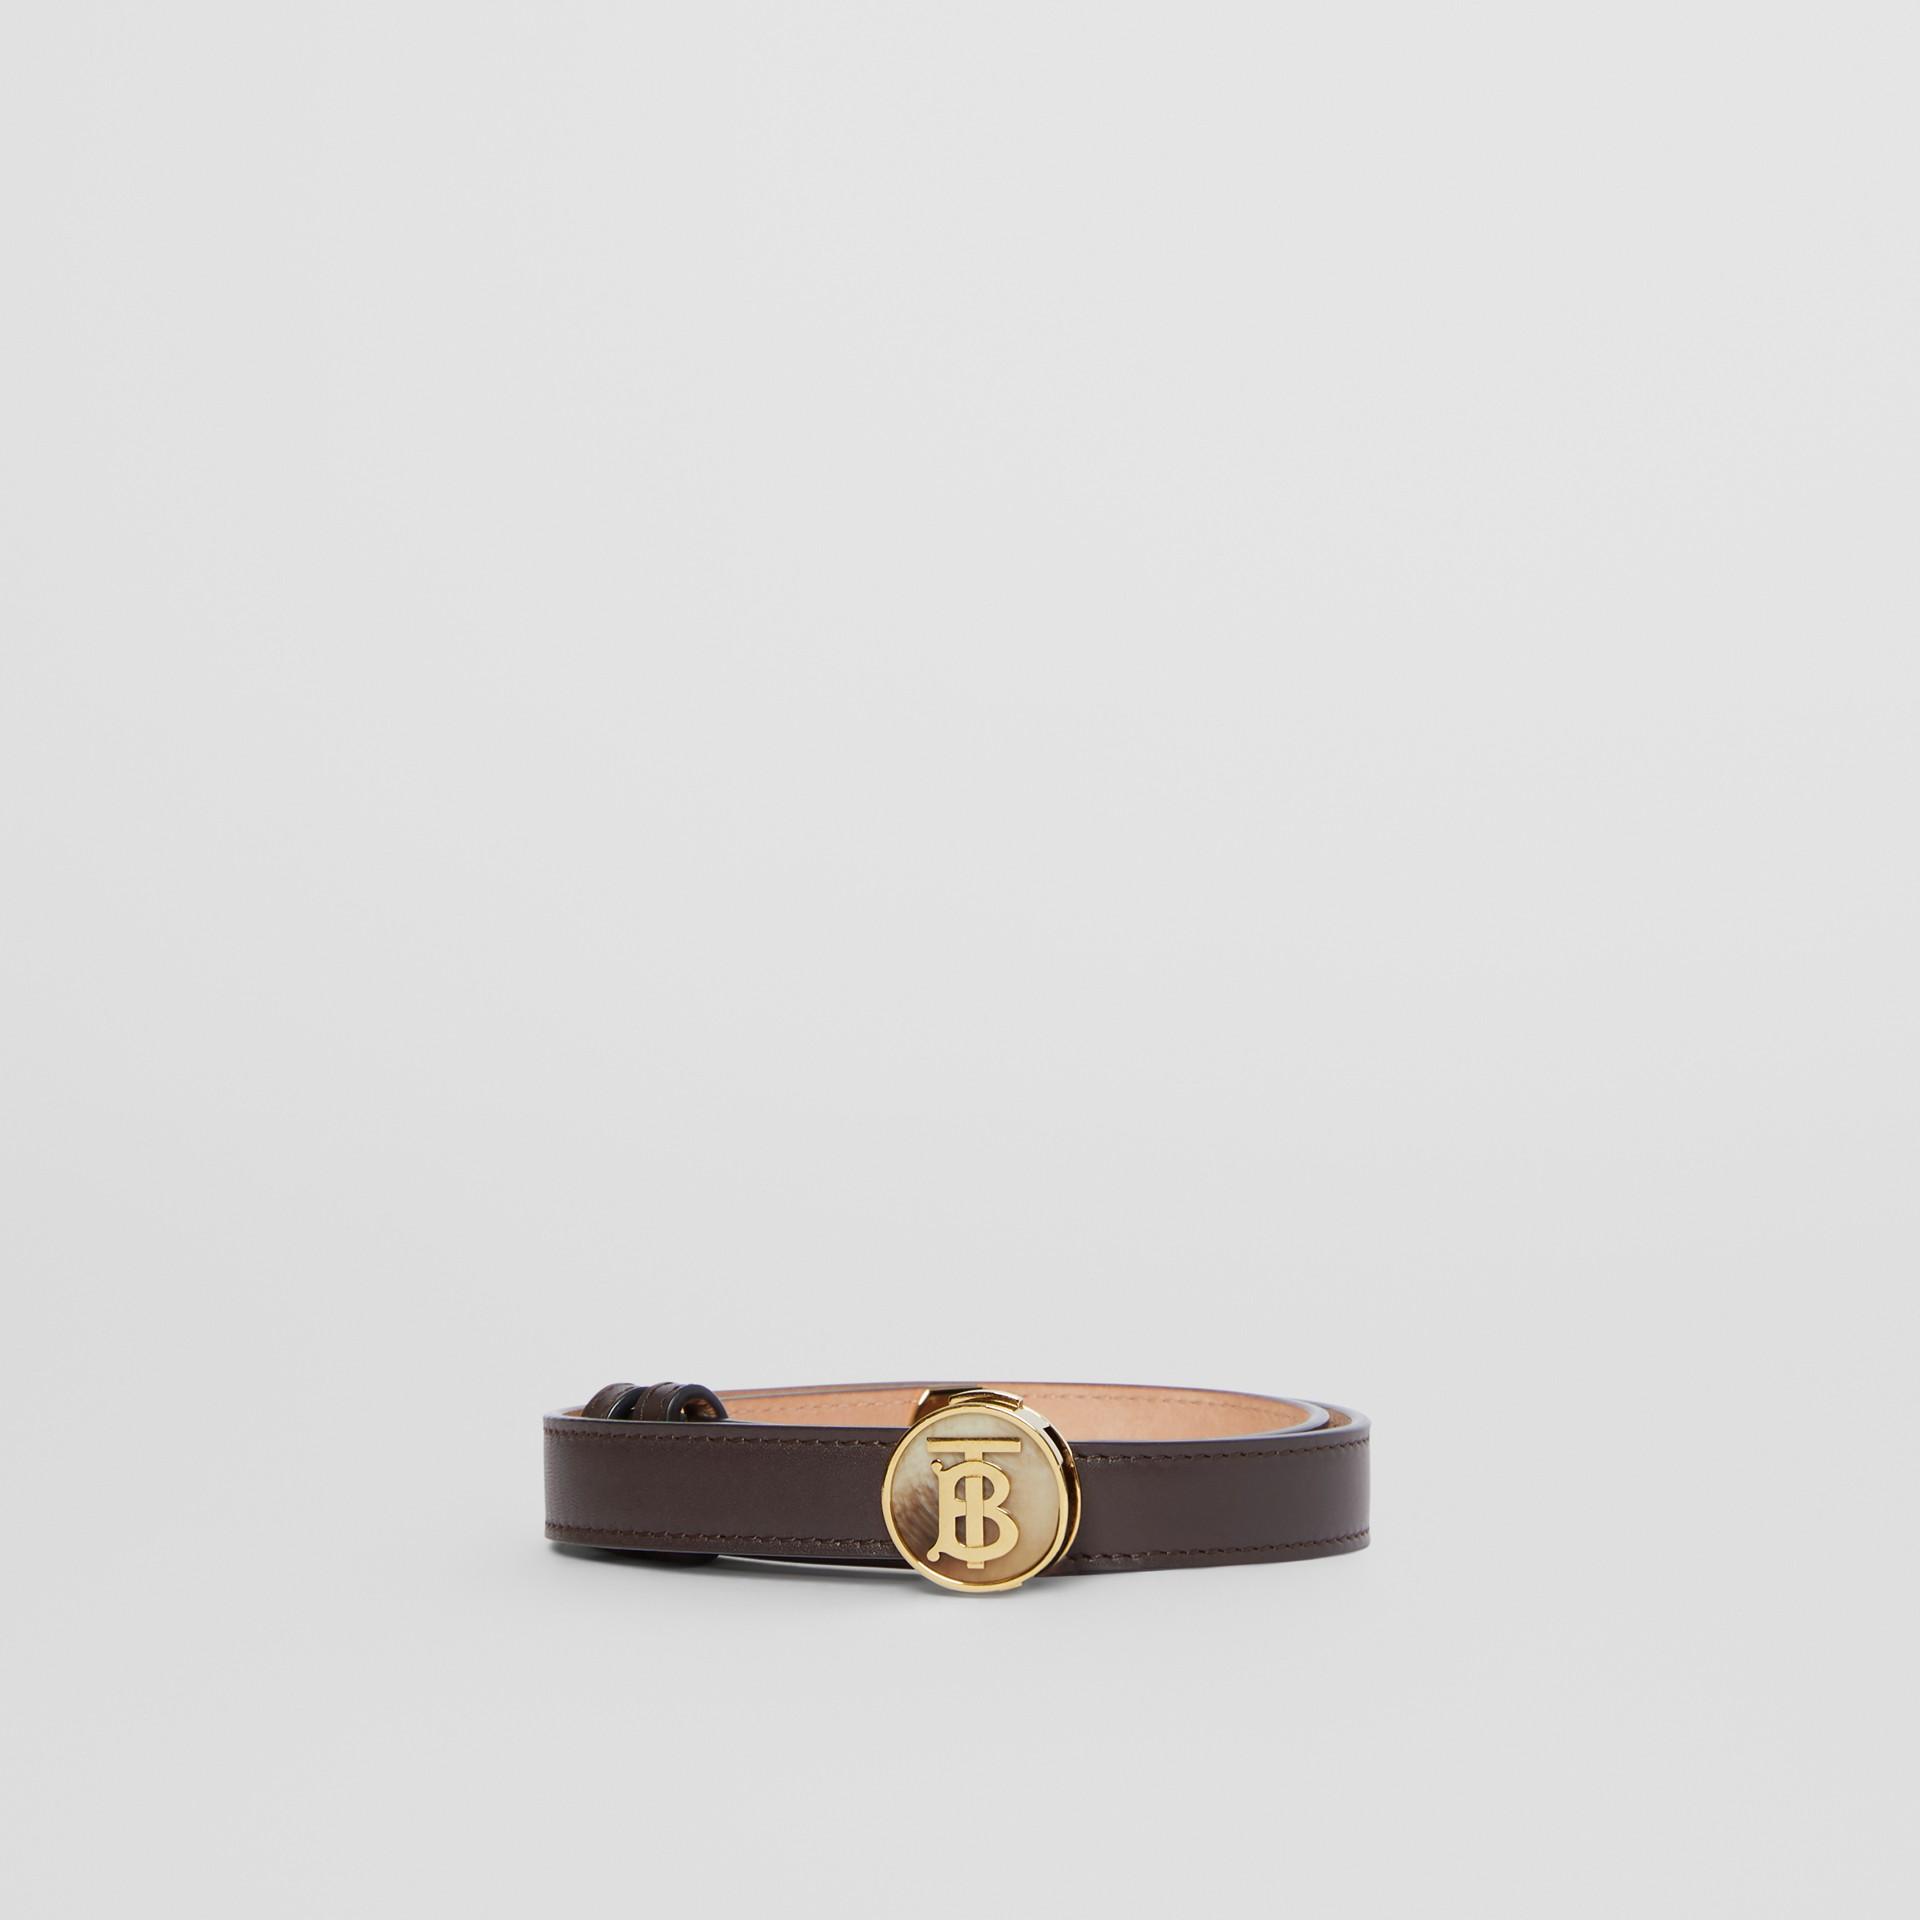 Monogram Motif Leather Belt in Deep Brown - Women | Burberry United Kingdom - gallery image 3